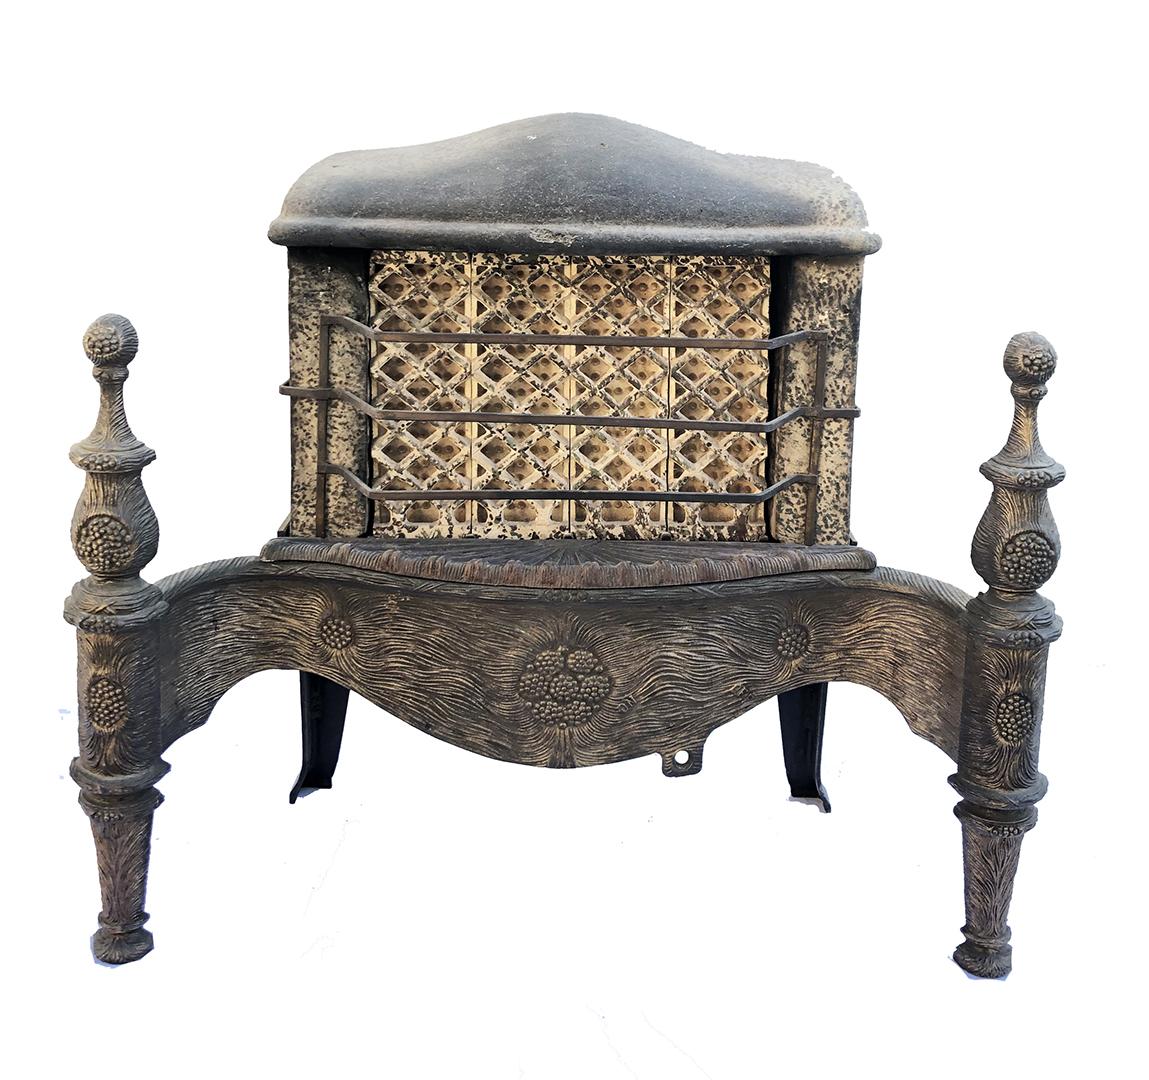 Antique Fireplace Backs Grates